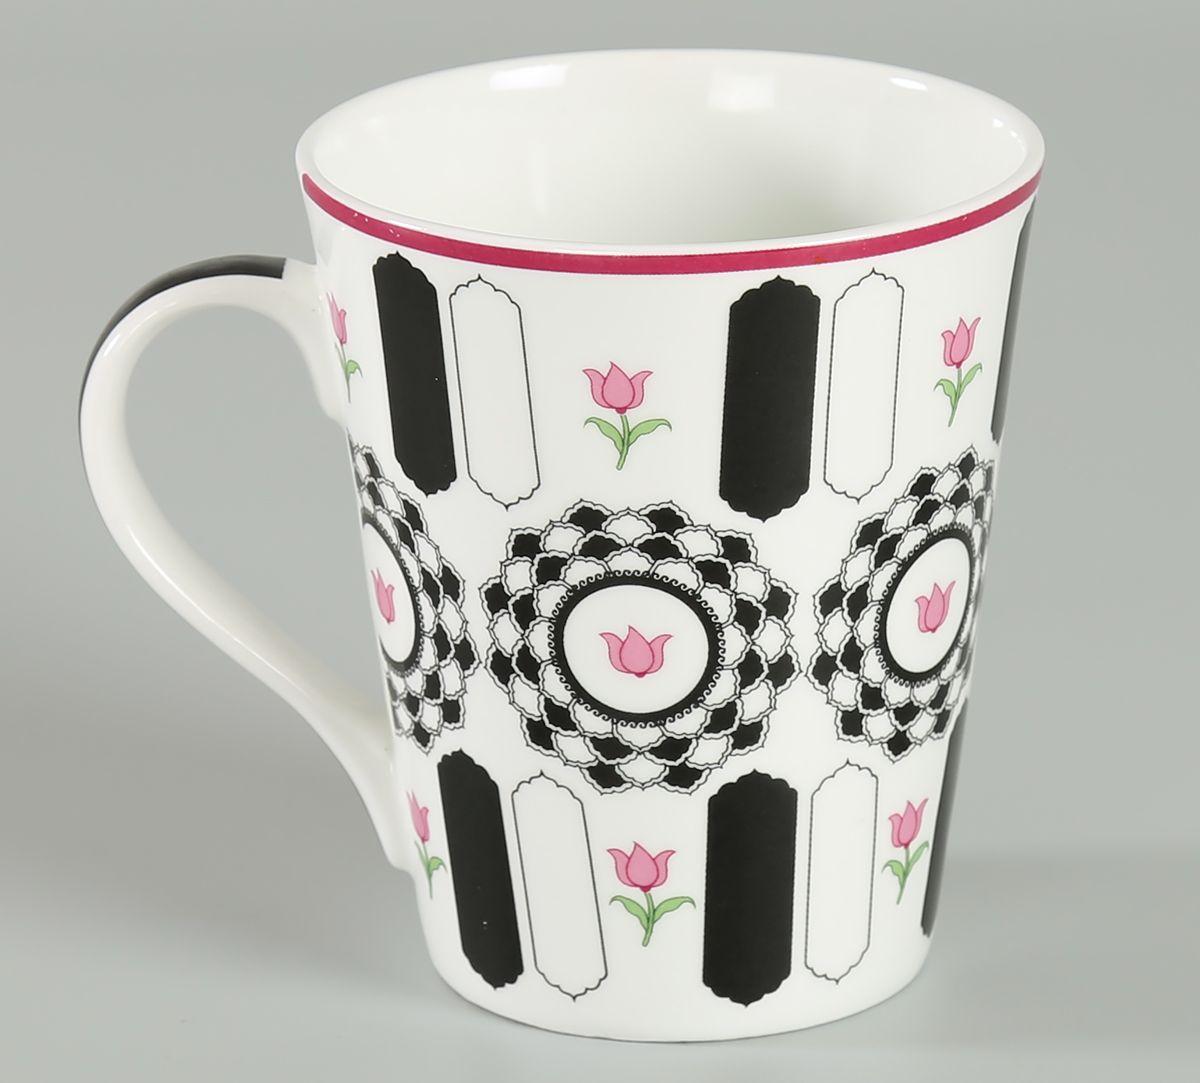 India Circus Appliqued Harmony Zing Mug (Set of 2)